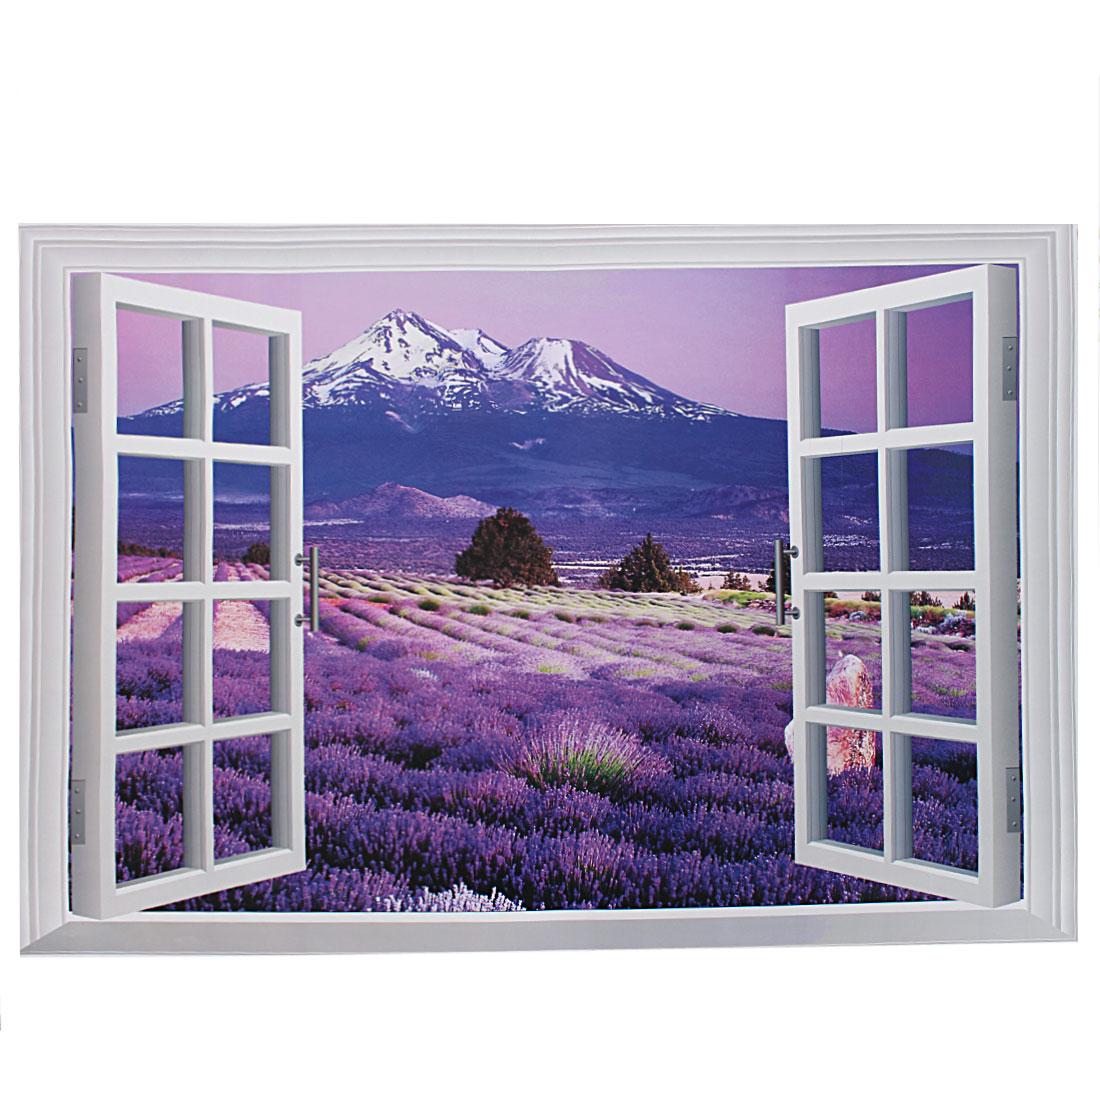 unique bargains home decor fake window background design unique bargains home decor display picture photo frame